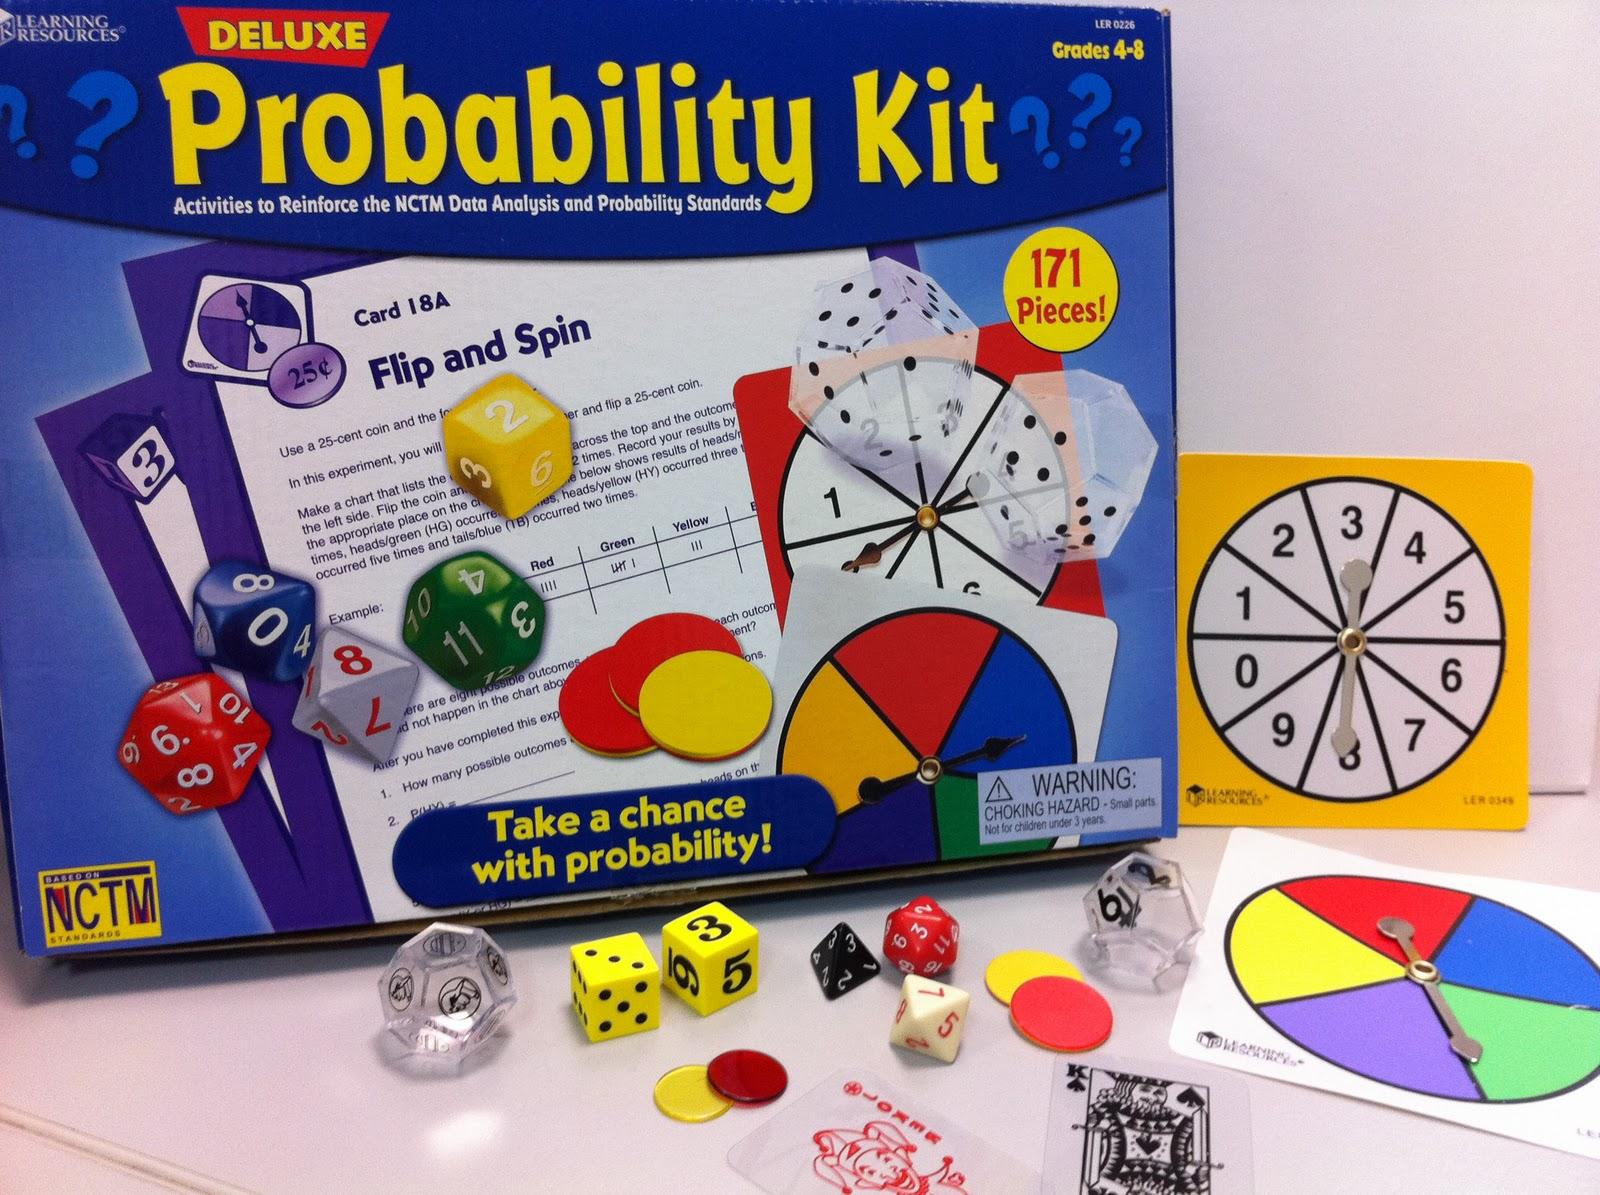 Msl Mathematics Resources Deluxe Probability Kit